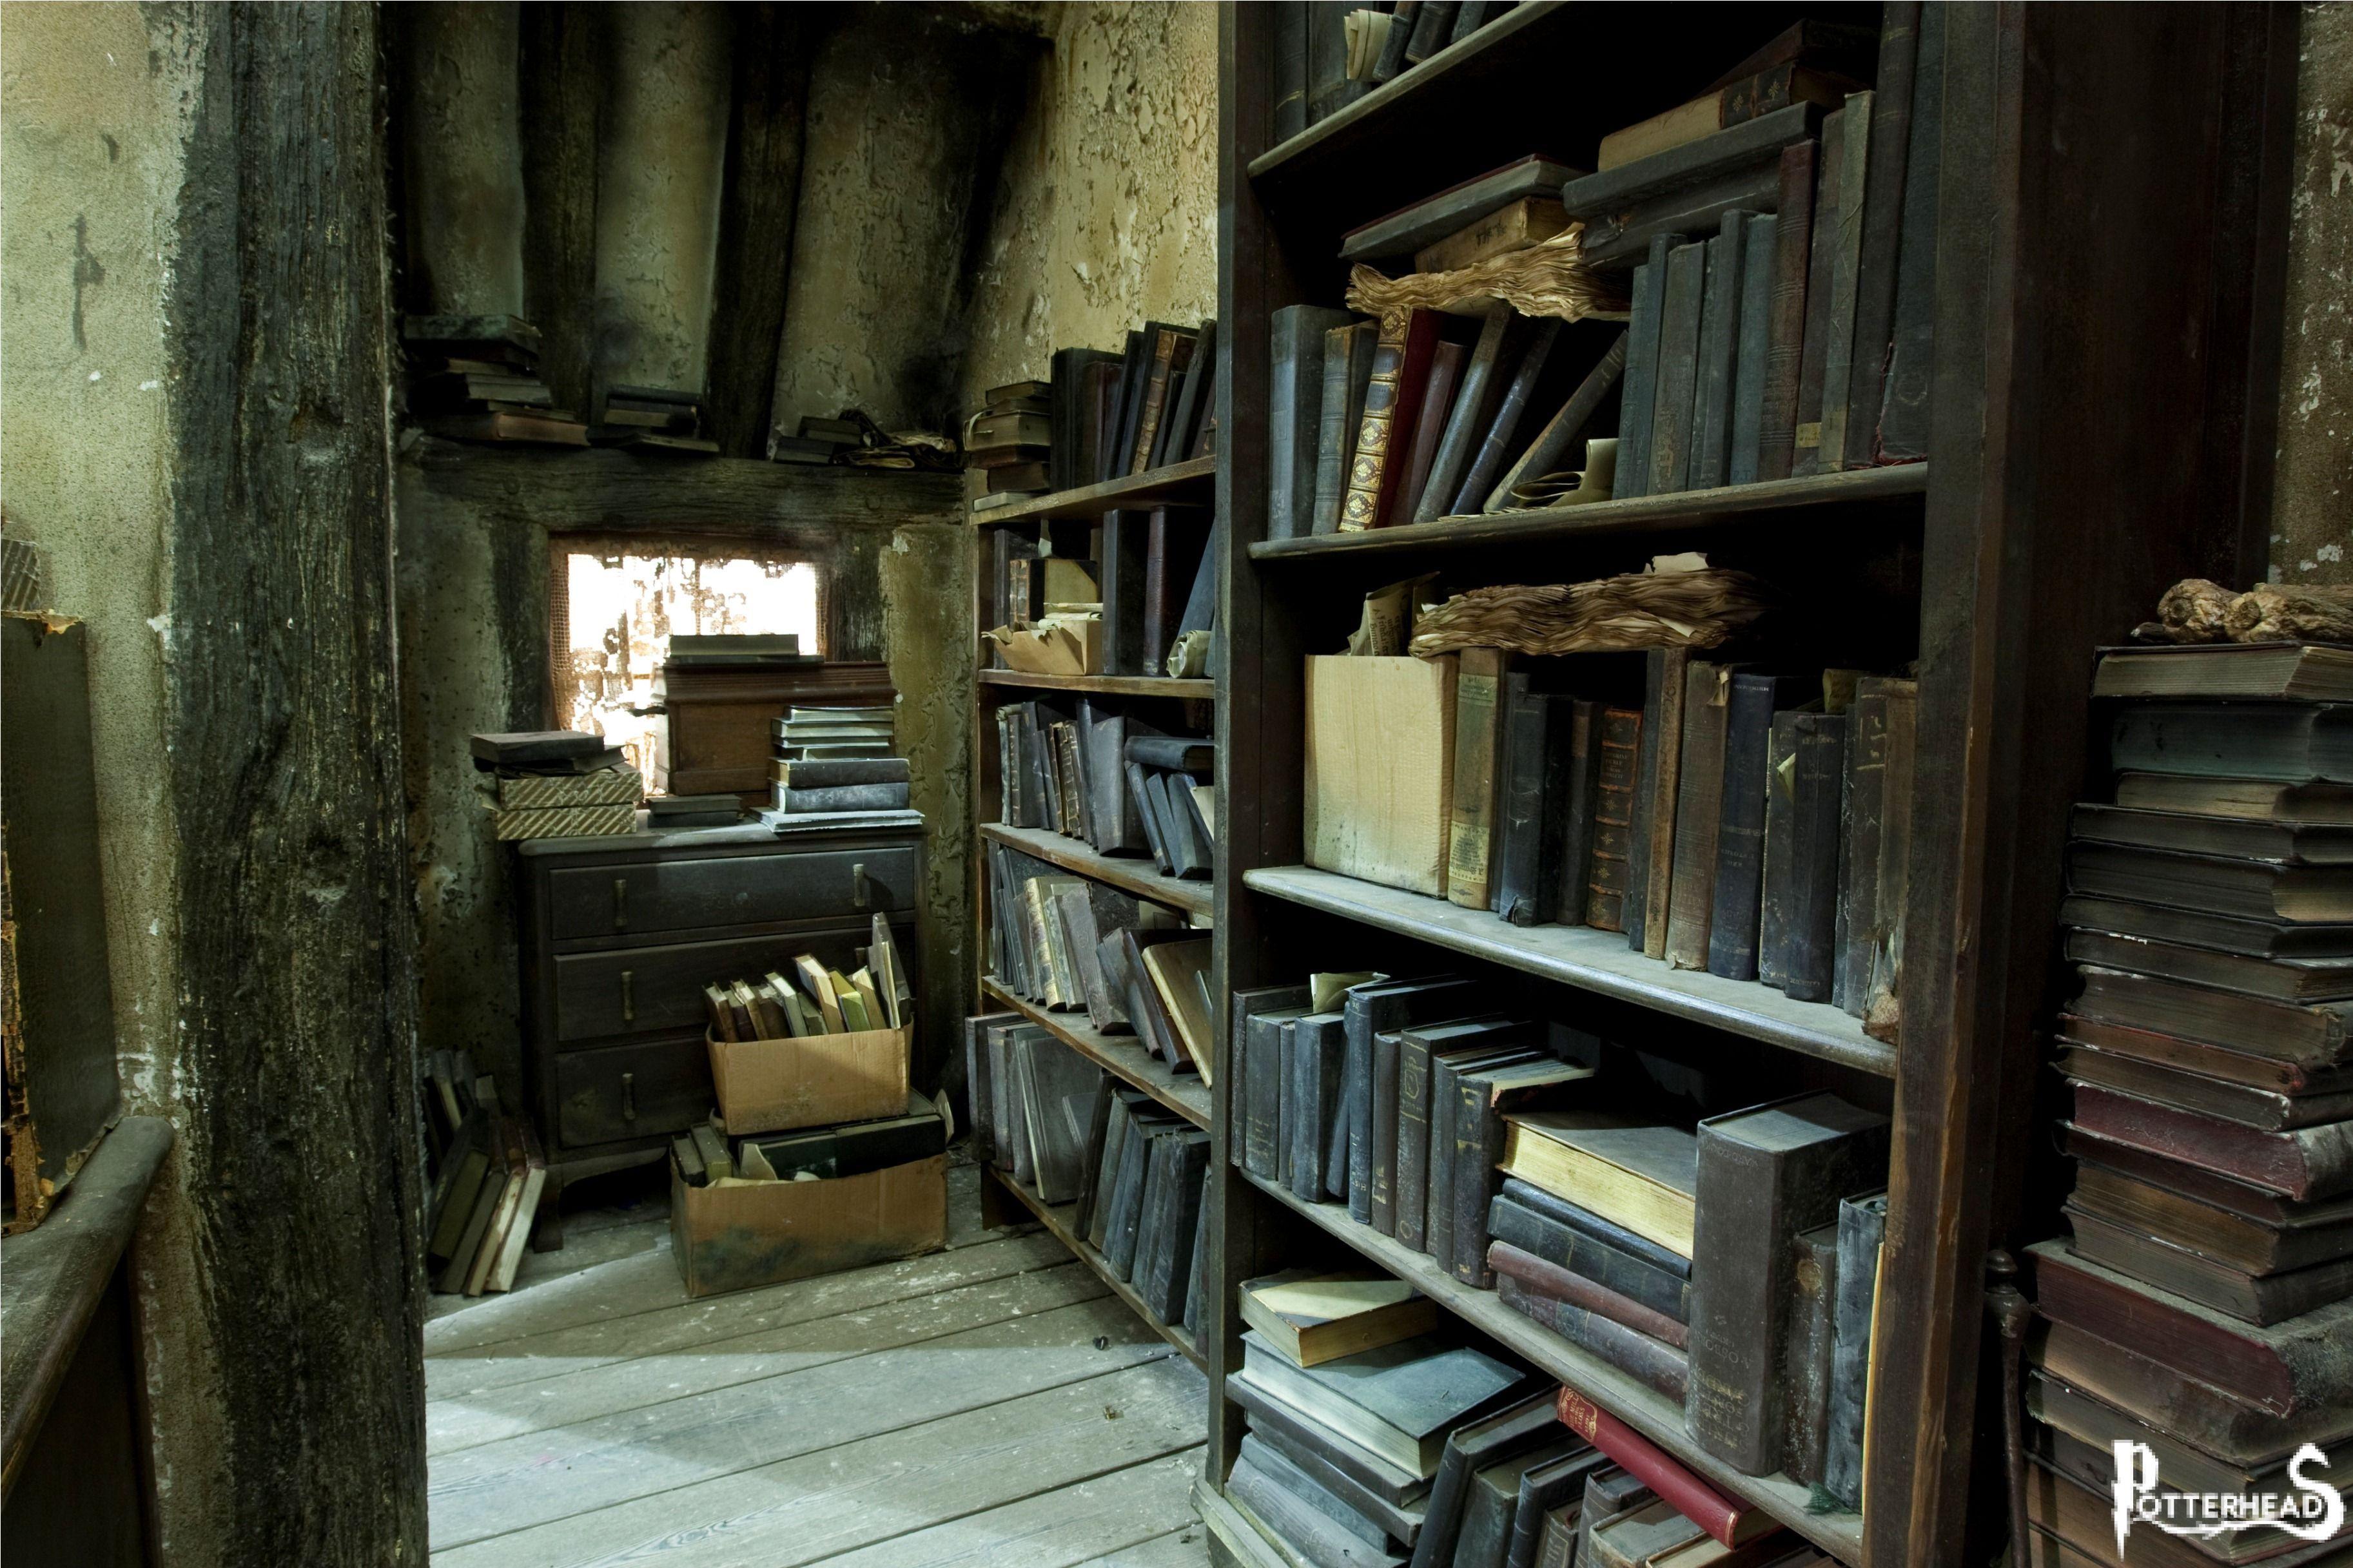 Casa di Bathilda Bath Harry Potter - PotterPedia.it